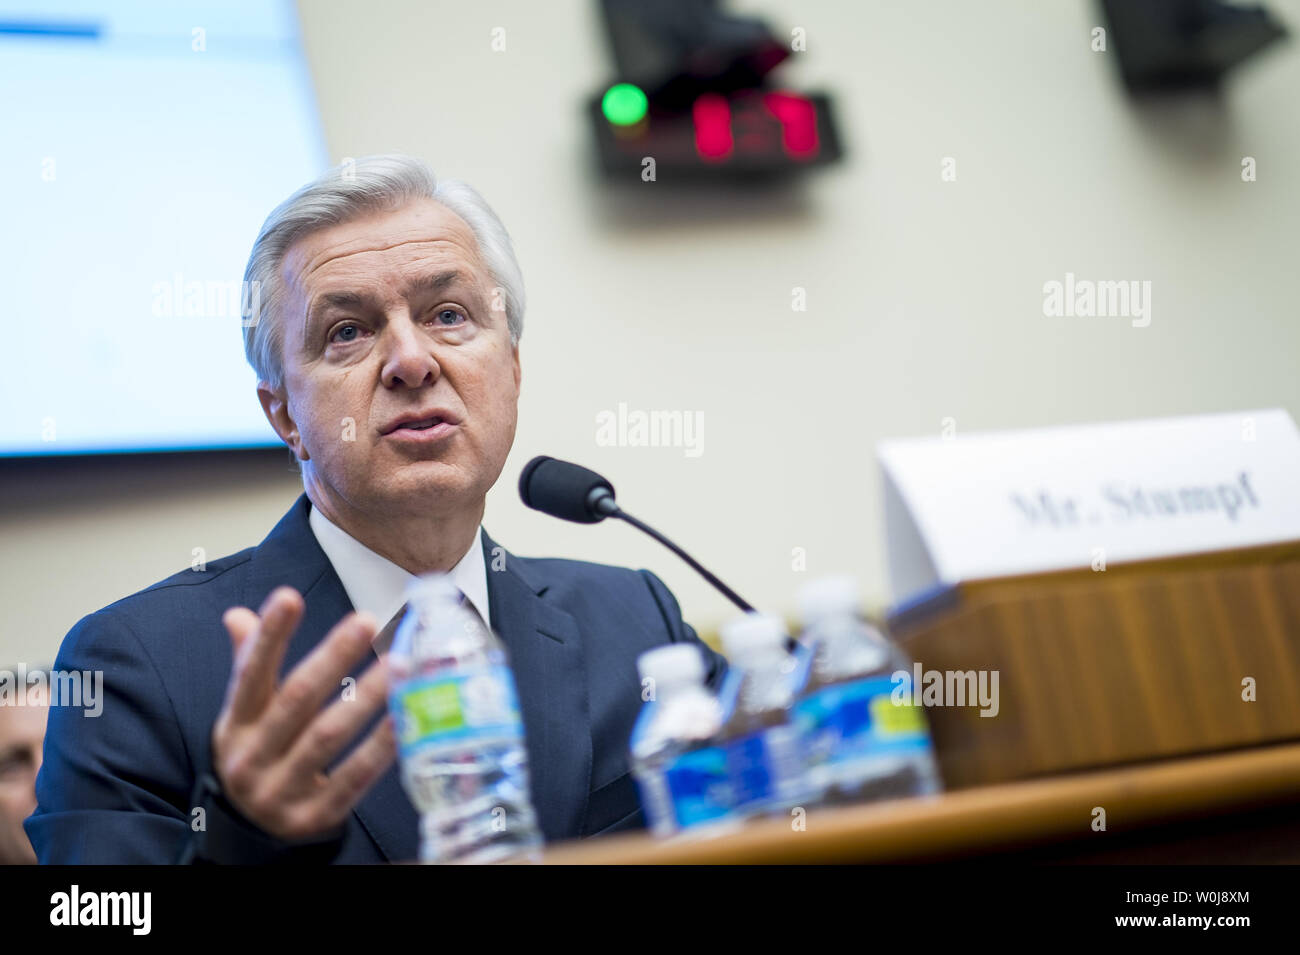 John Stumpf, chairman and CEO of Wells Fargo & Company, testifies